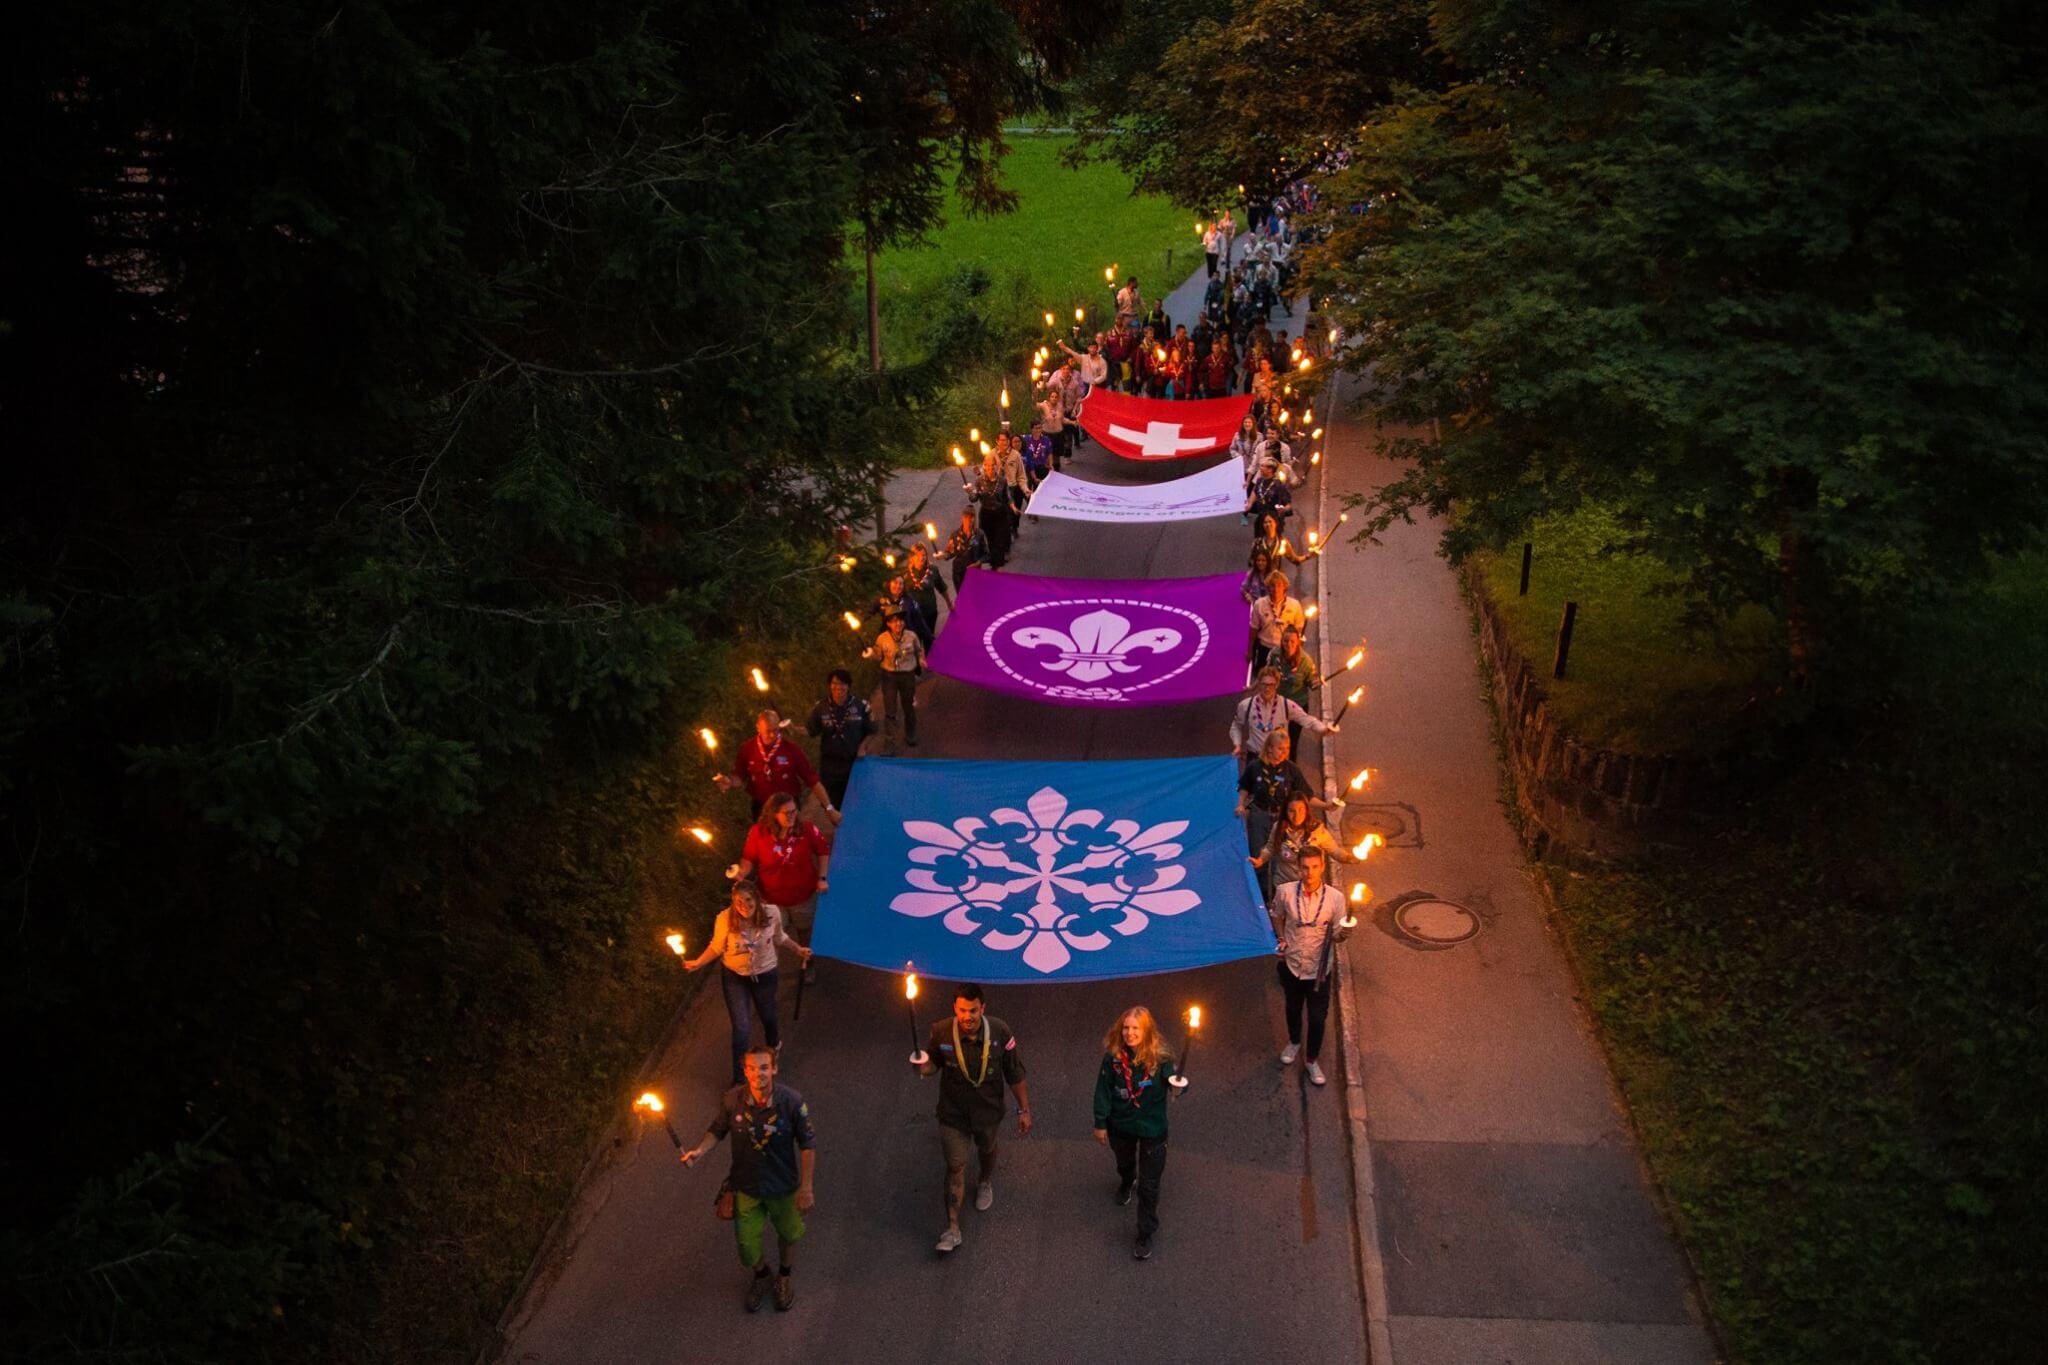 Kandersteg International Scout Centre Street Parade